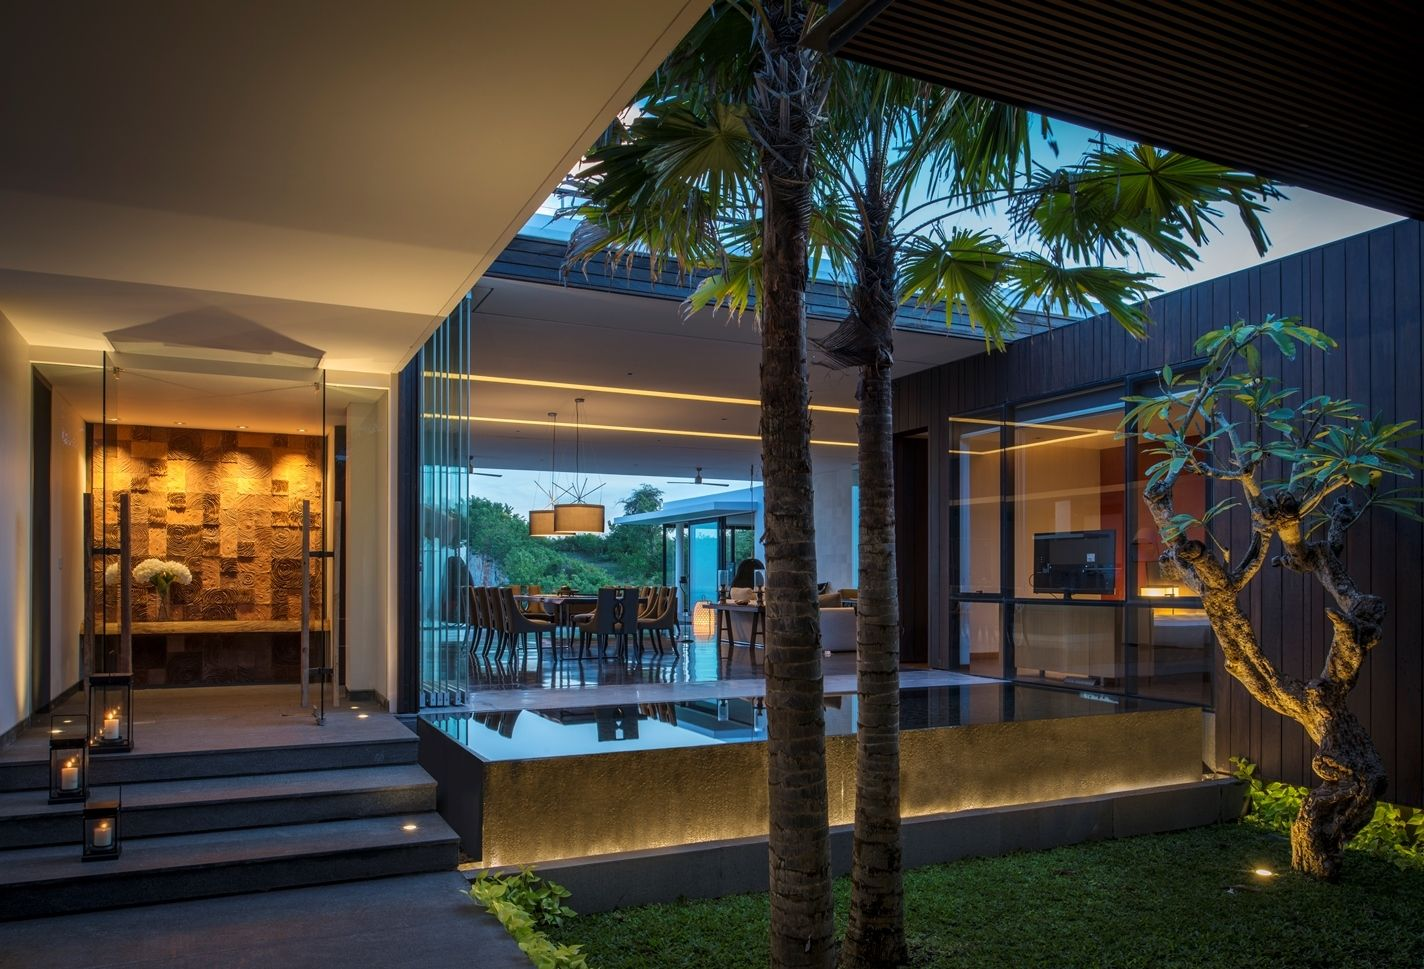 Rumah Minimalis Gaya Bali_8 | DREAMY HOUSE | Pinterest | House, Modern And  Smallest House